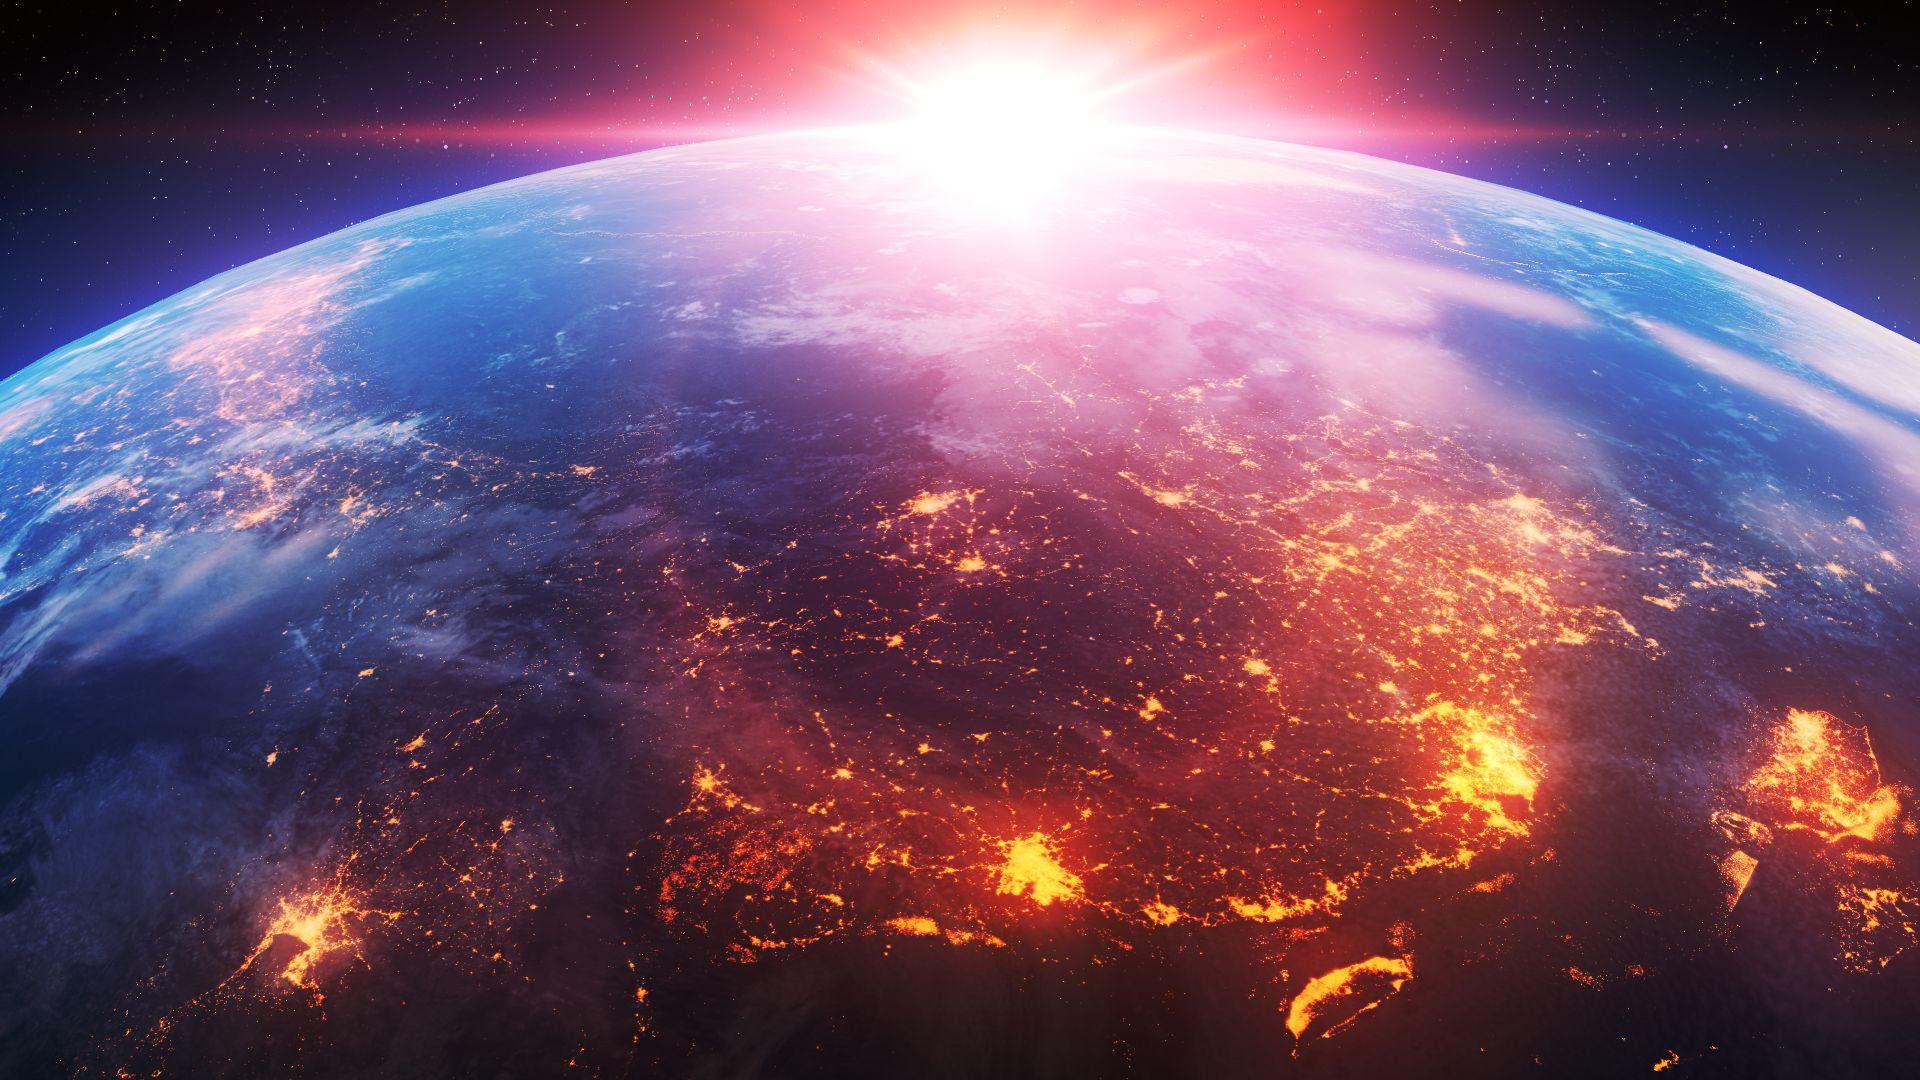 Earth 1080p